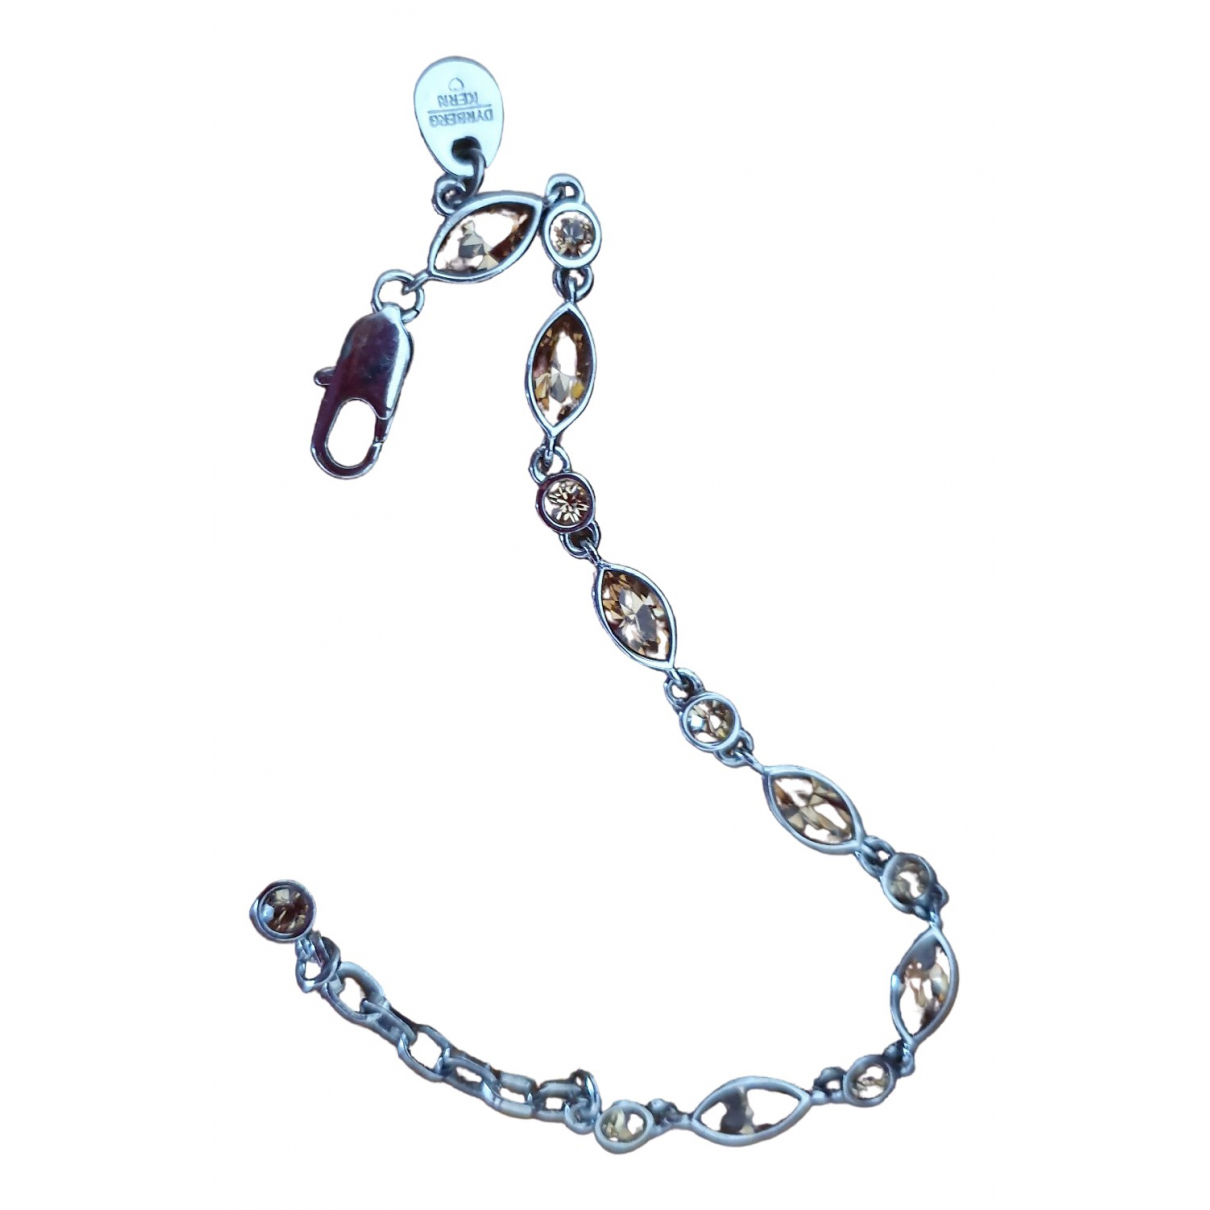 Dyrberg/kern \N Armband in  Braun Silber